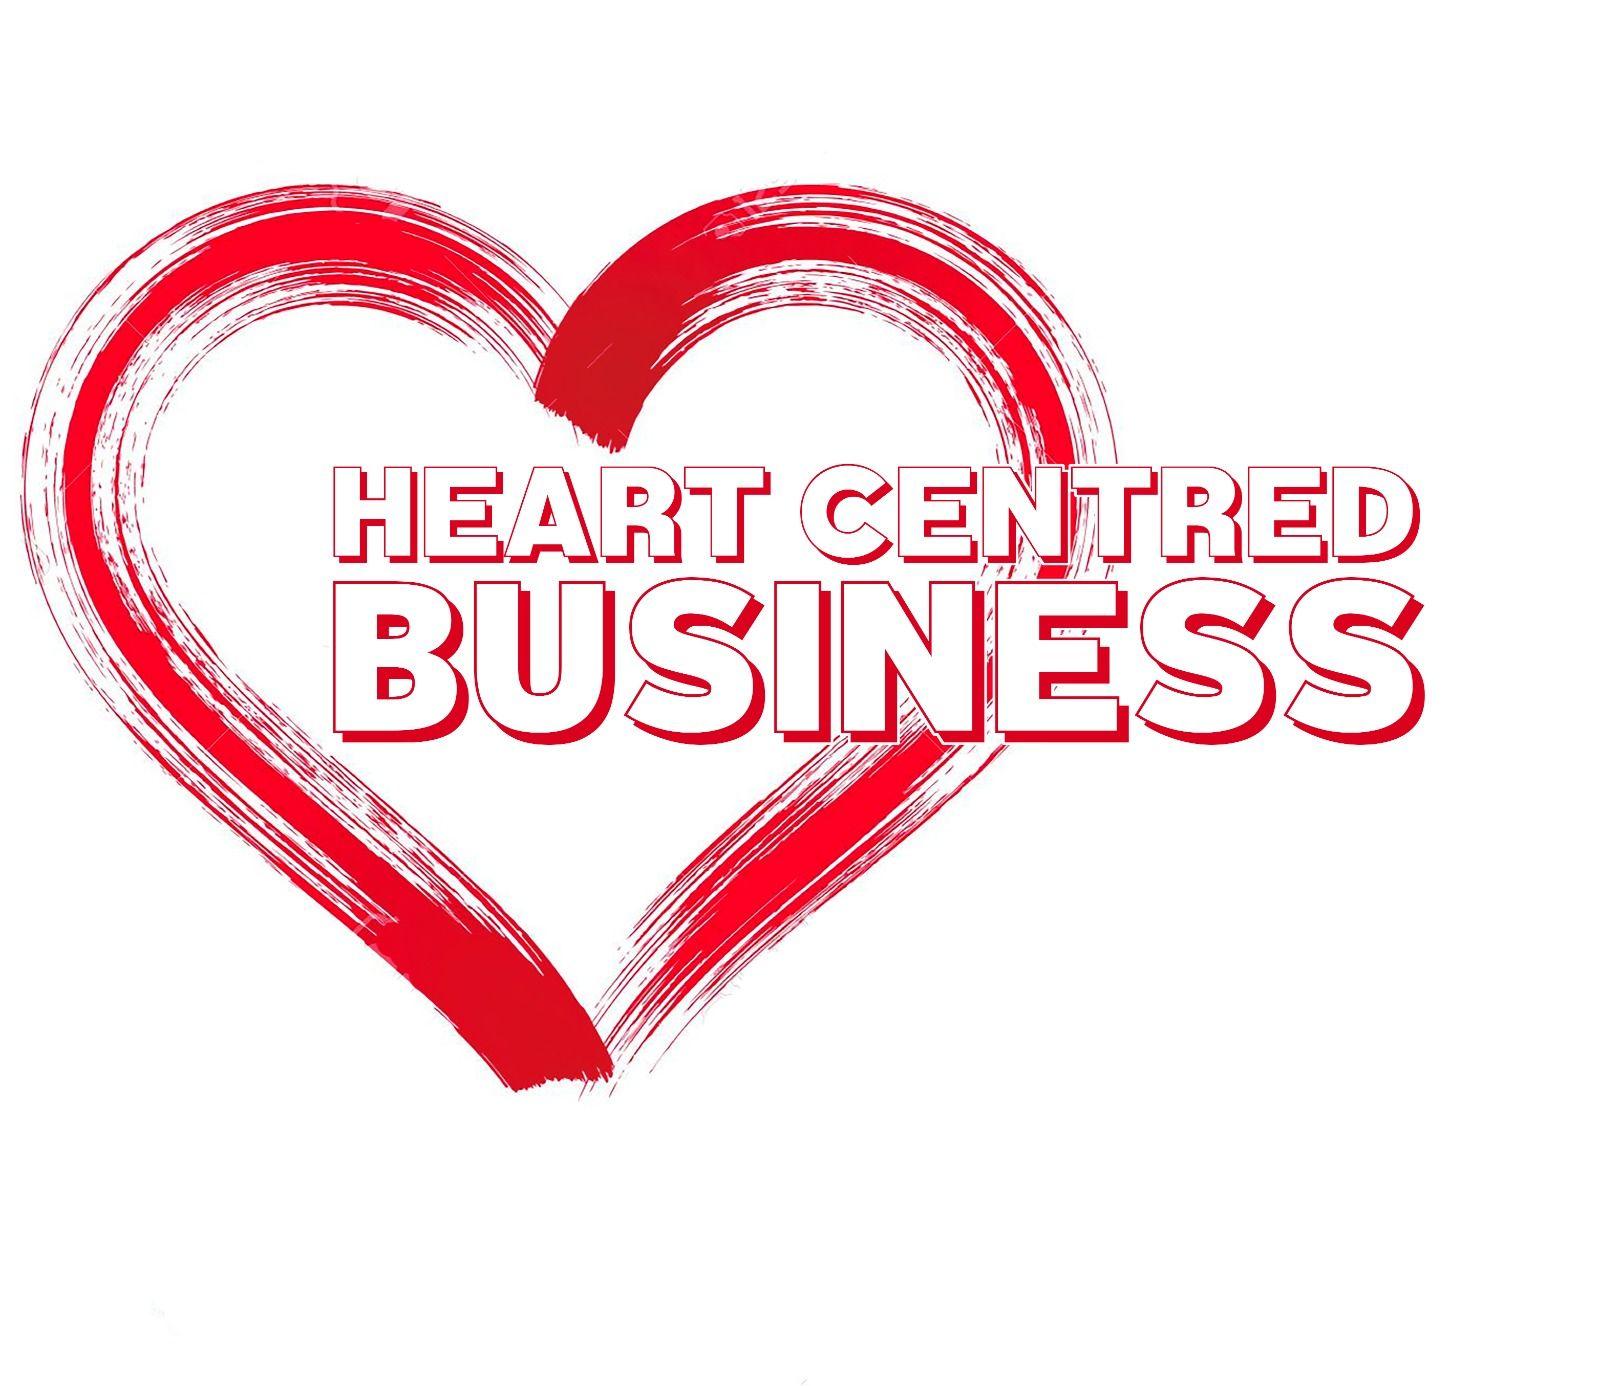 Heart Centred Business Ltd